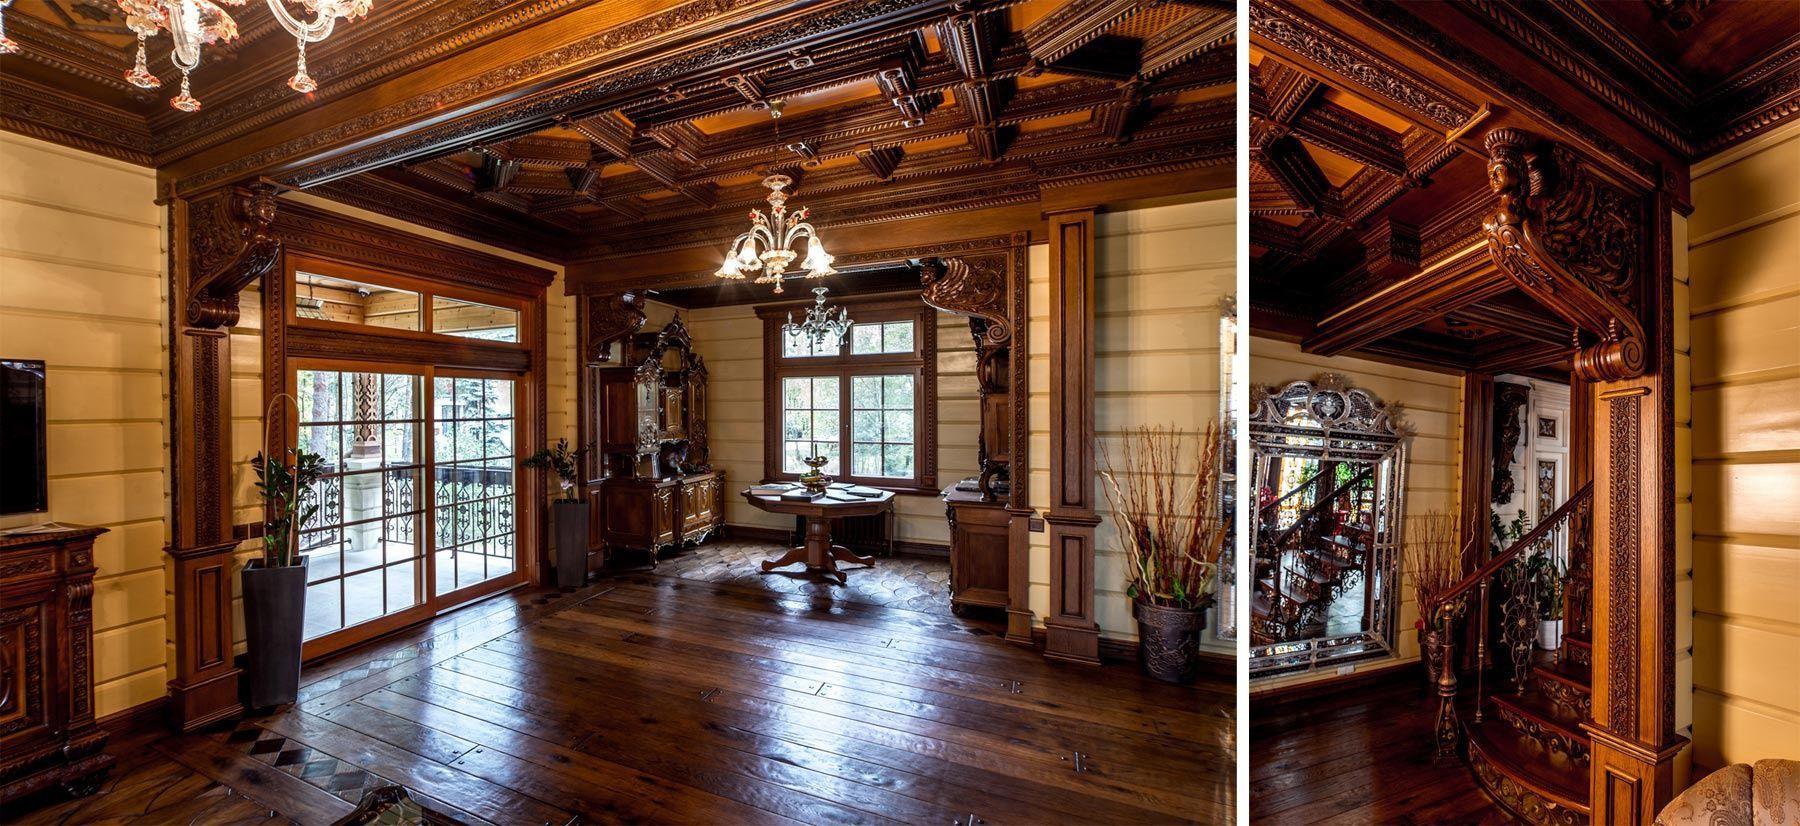 Отделка старого загородного дома внутри фото